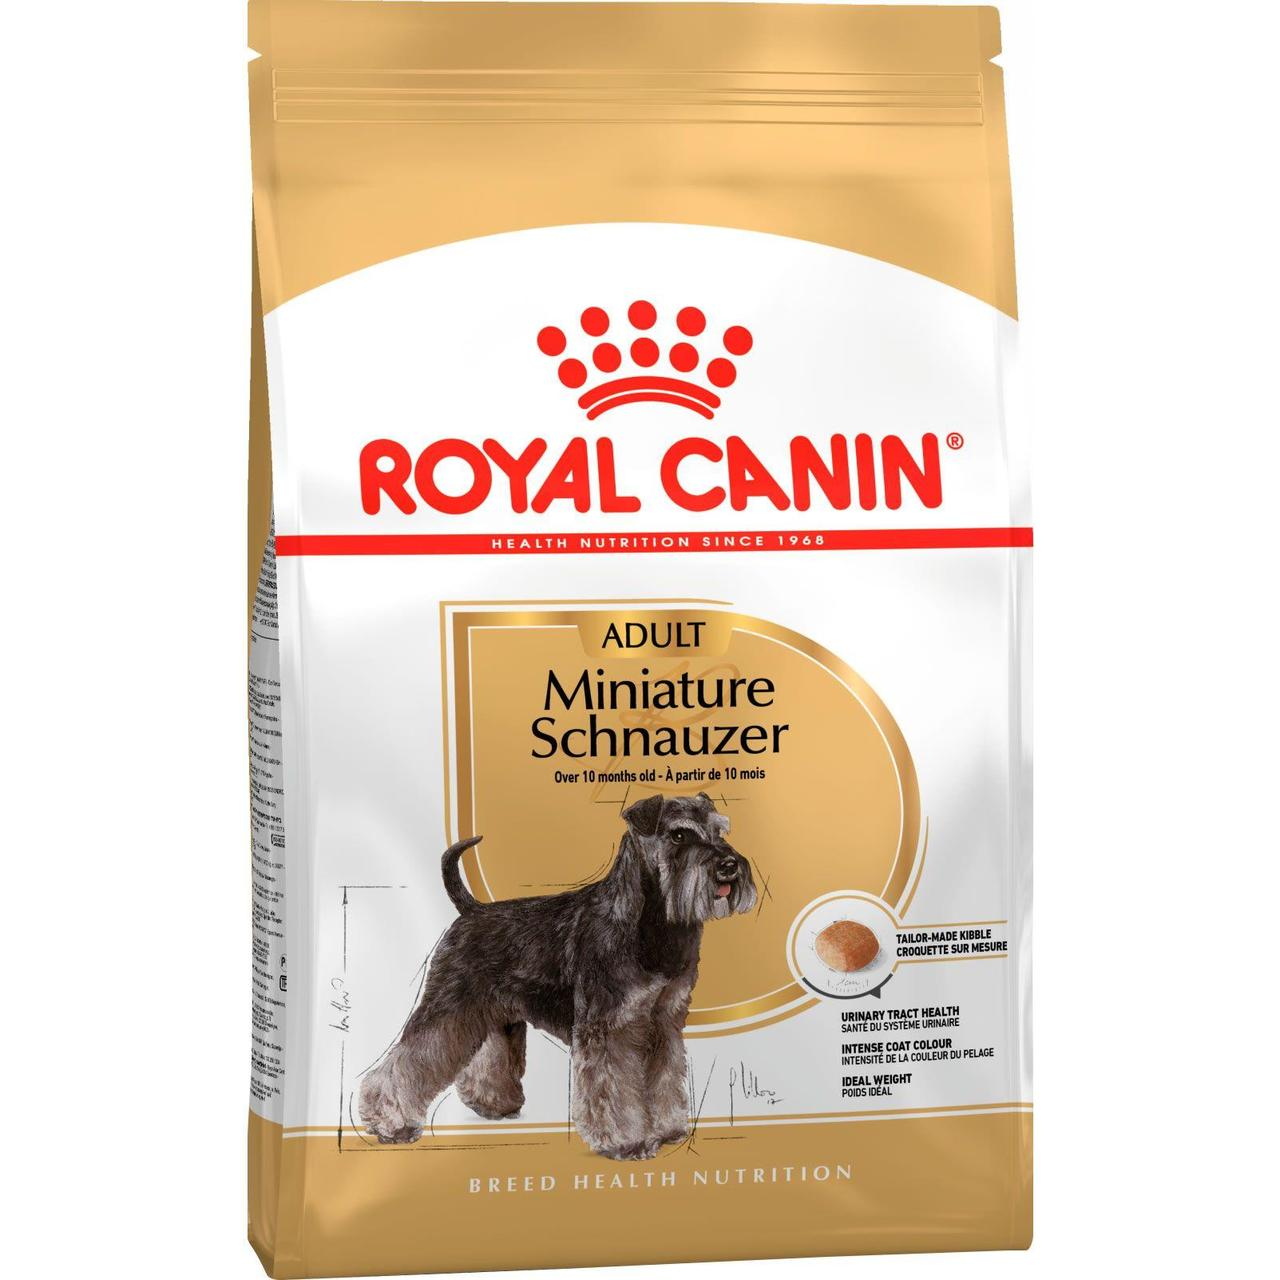 Корм для шнауцеров Royal Canin Miniature Schnauzer, 7,5 кг, роял канин